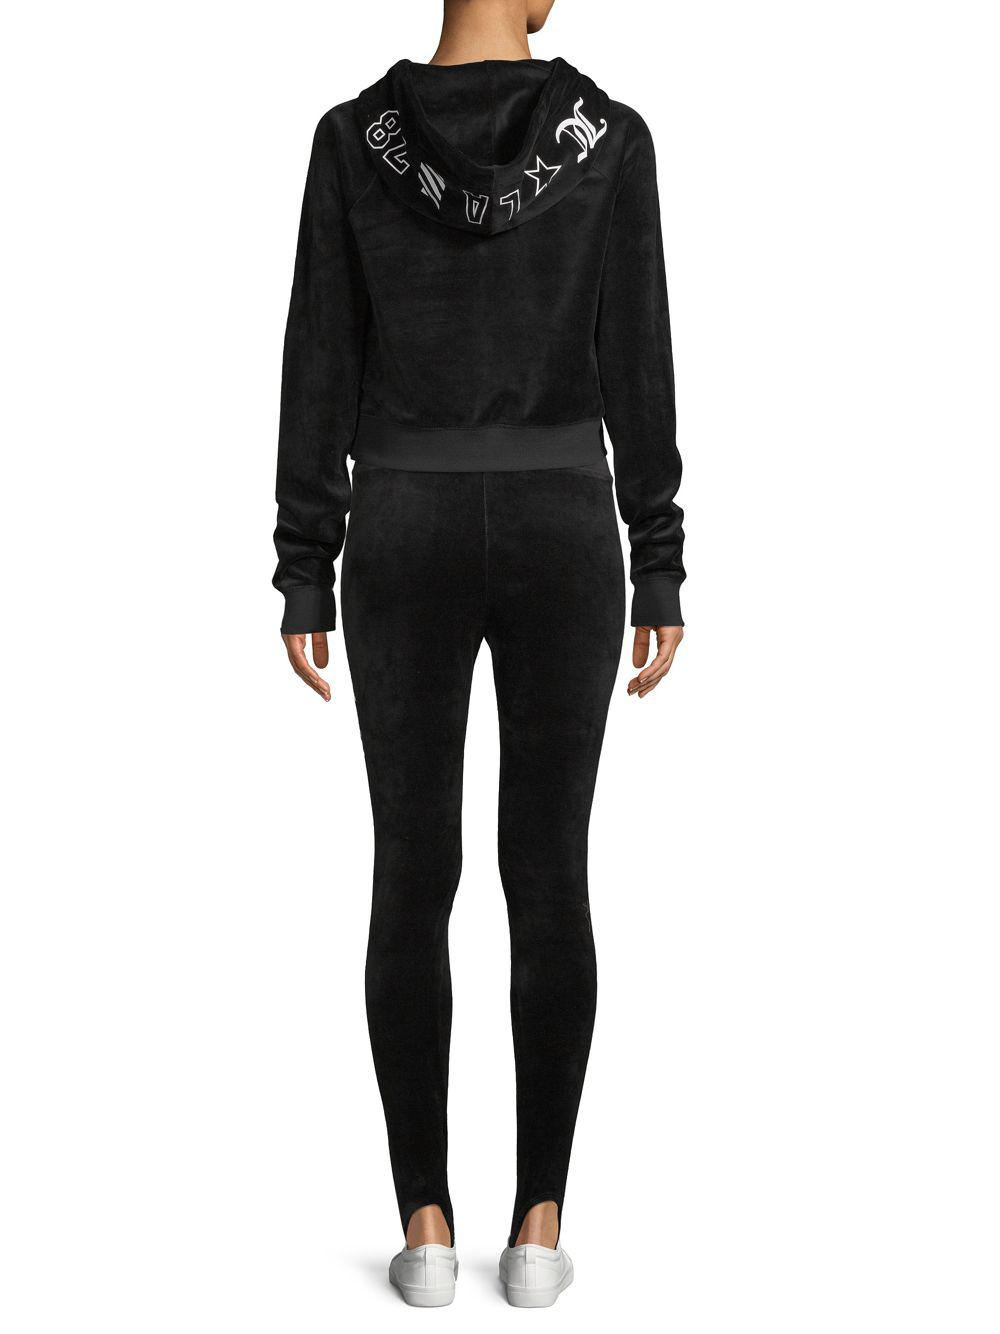 6339d63fa4af8 Juicy Couture Velour Stirrup Leggings in Black - Lyst